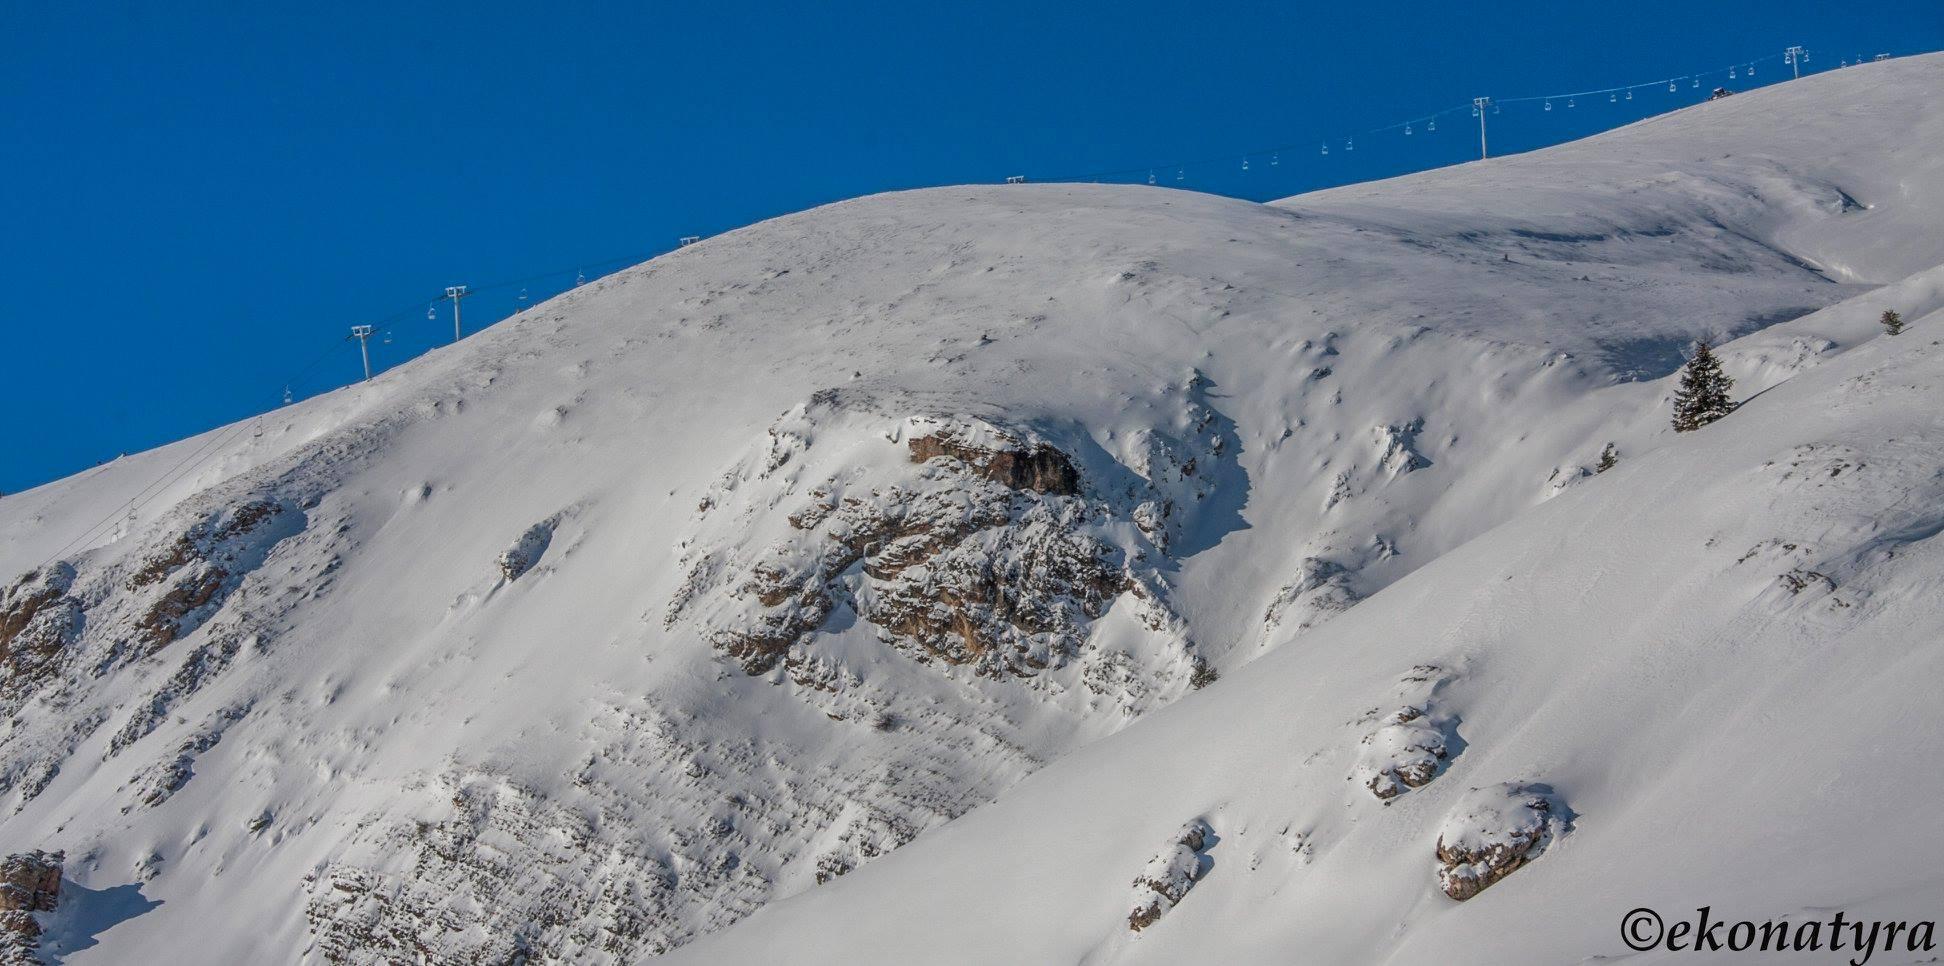 The Sunny Hill Ski Mountain